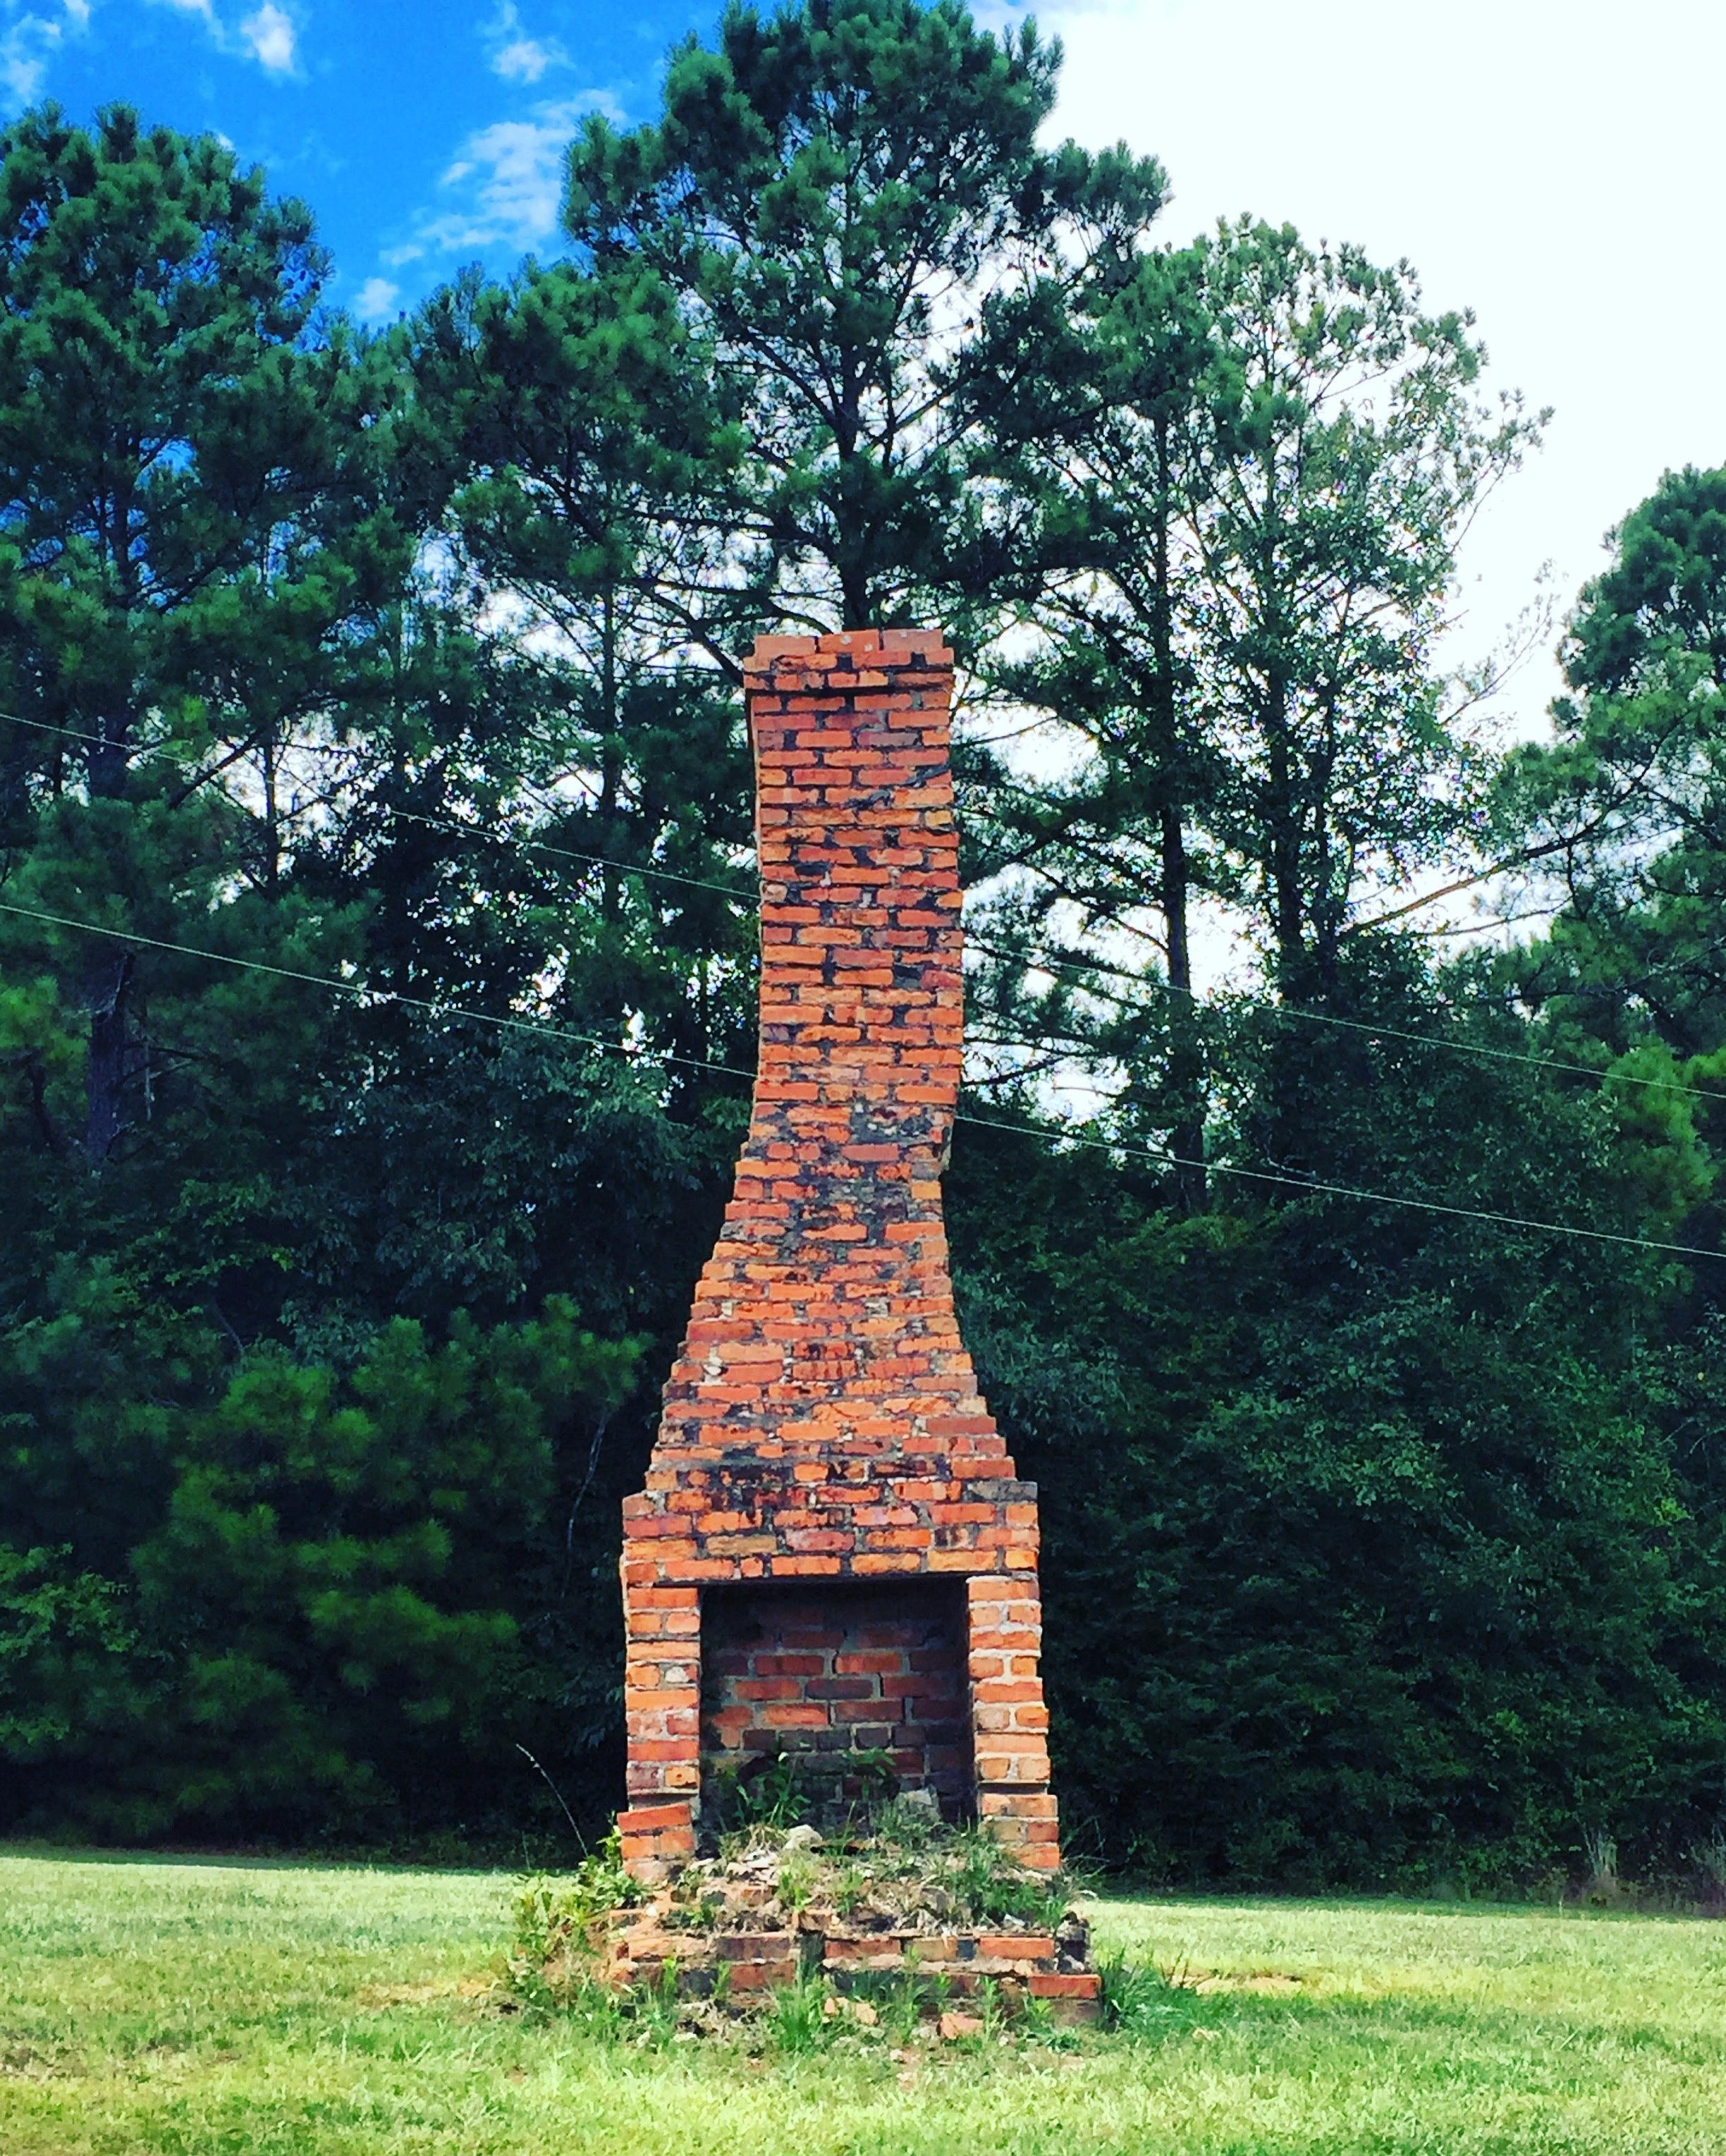 Chambers County, Alabama, United States of America